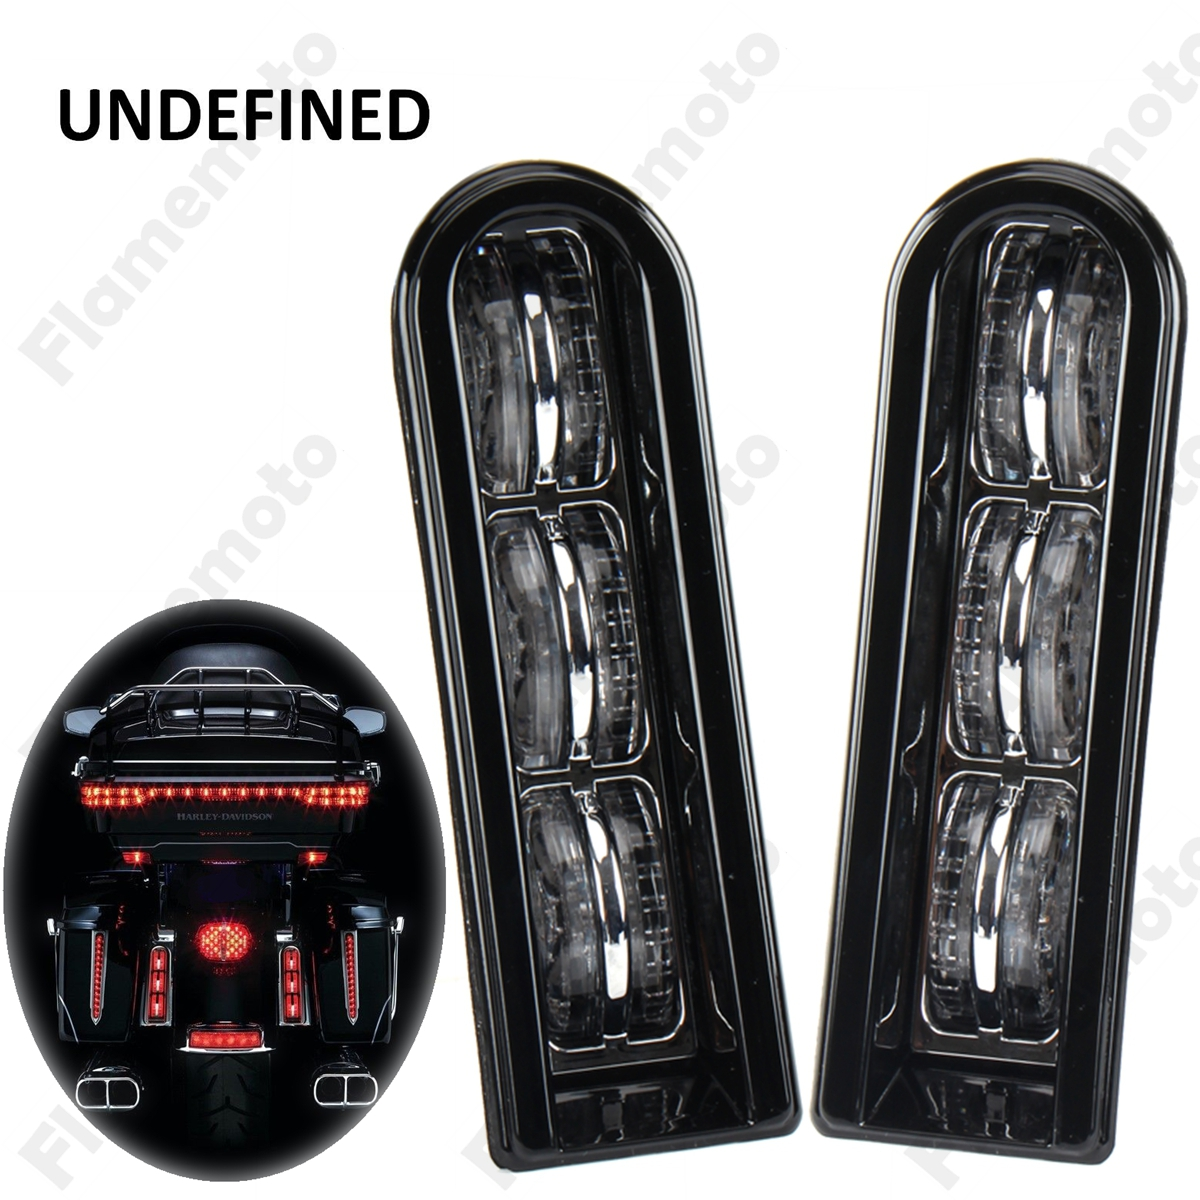 Black Motorcycle Parts Accent Saddlebag Filler Insert Support LED Lights For Harley Touring Electra Road Glide CVO UNDEFINED